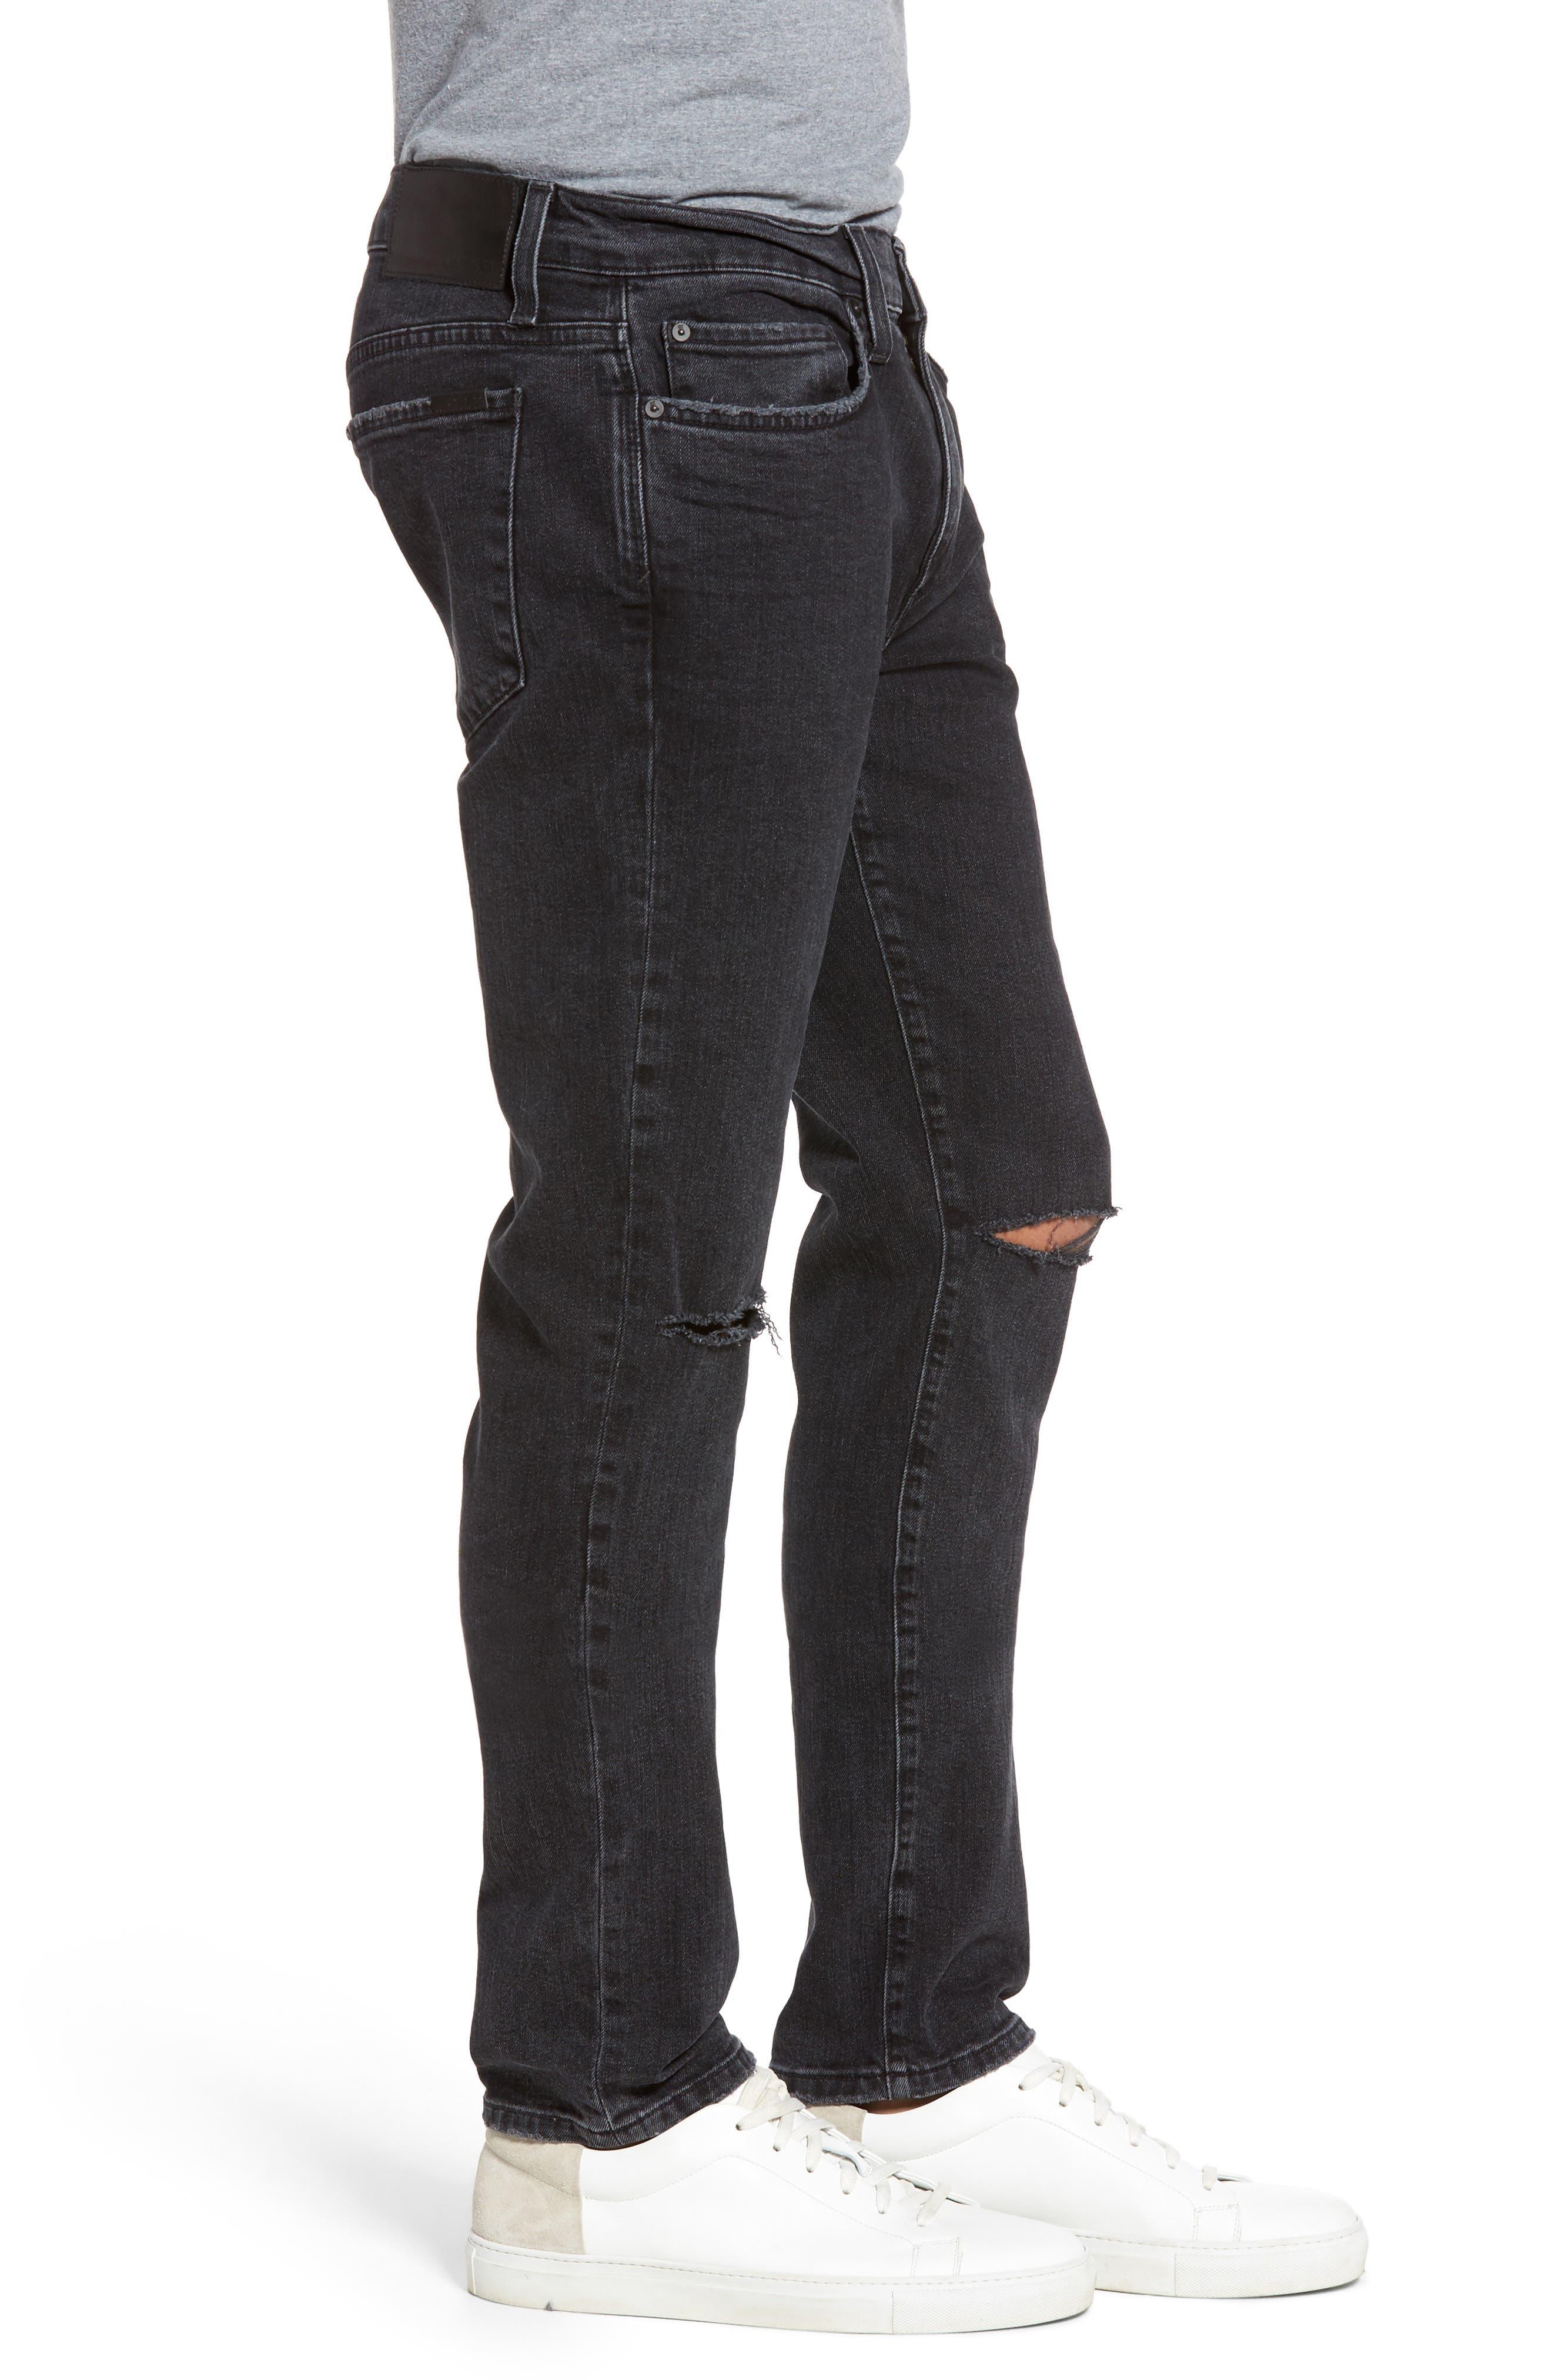 Brixton Slim Straight Fit Jeans,                             Alternate thumbnail 3, color,                             438